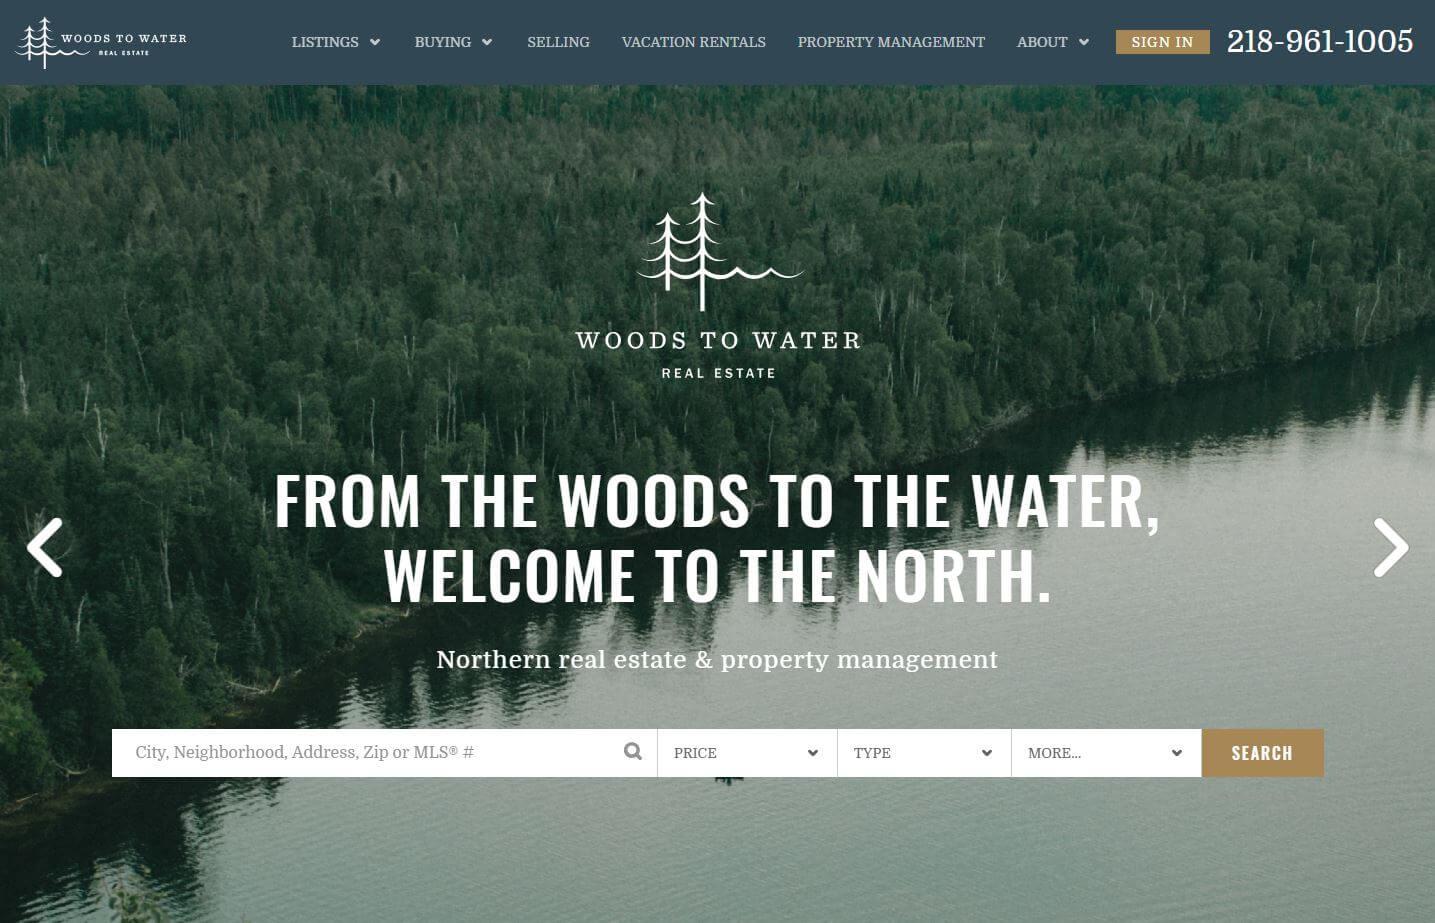 woodstowatermn.com